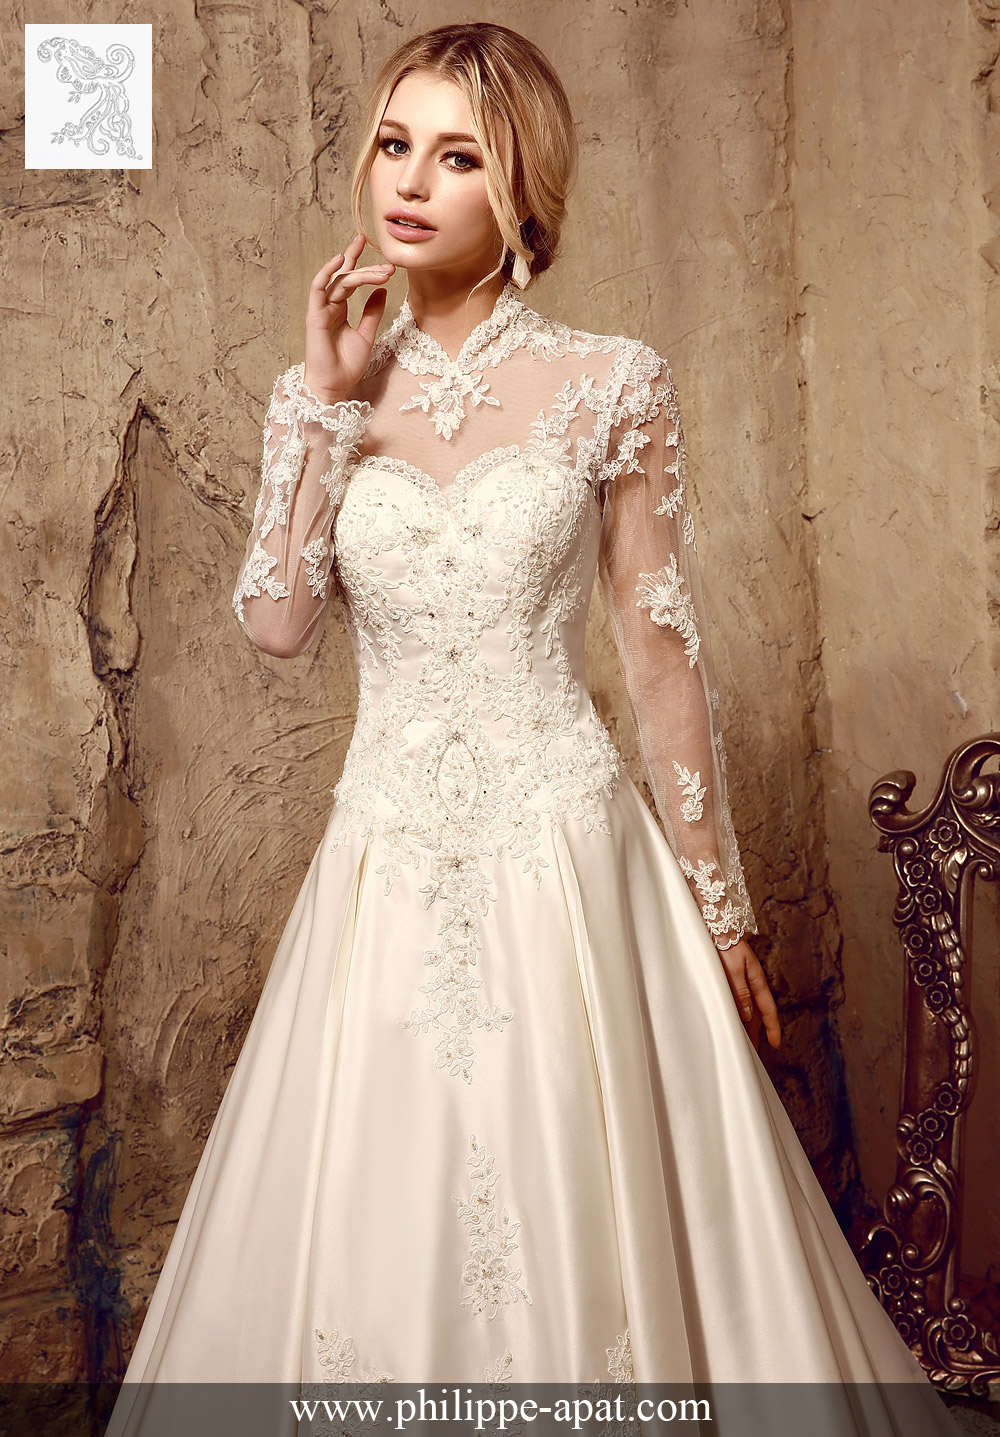 b4302ff4fd131 Une robe blanche mariage - La boutique de Maud